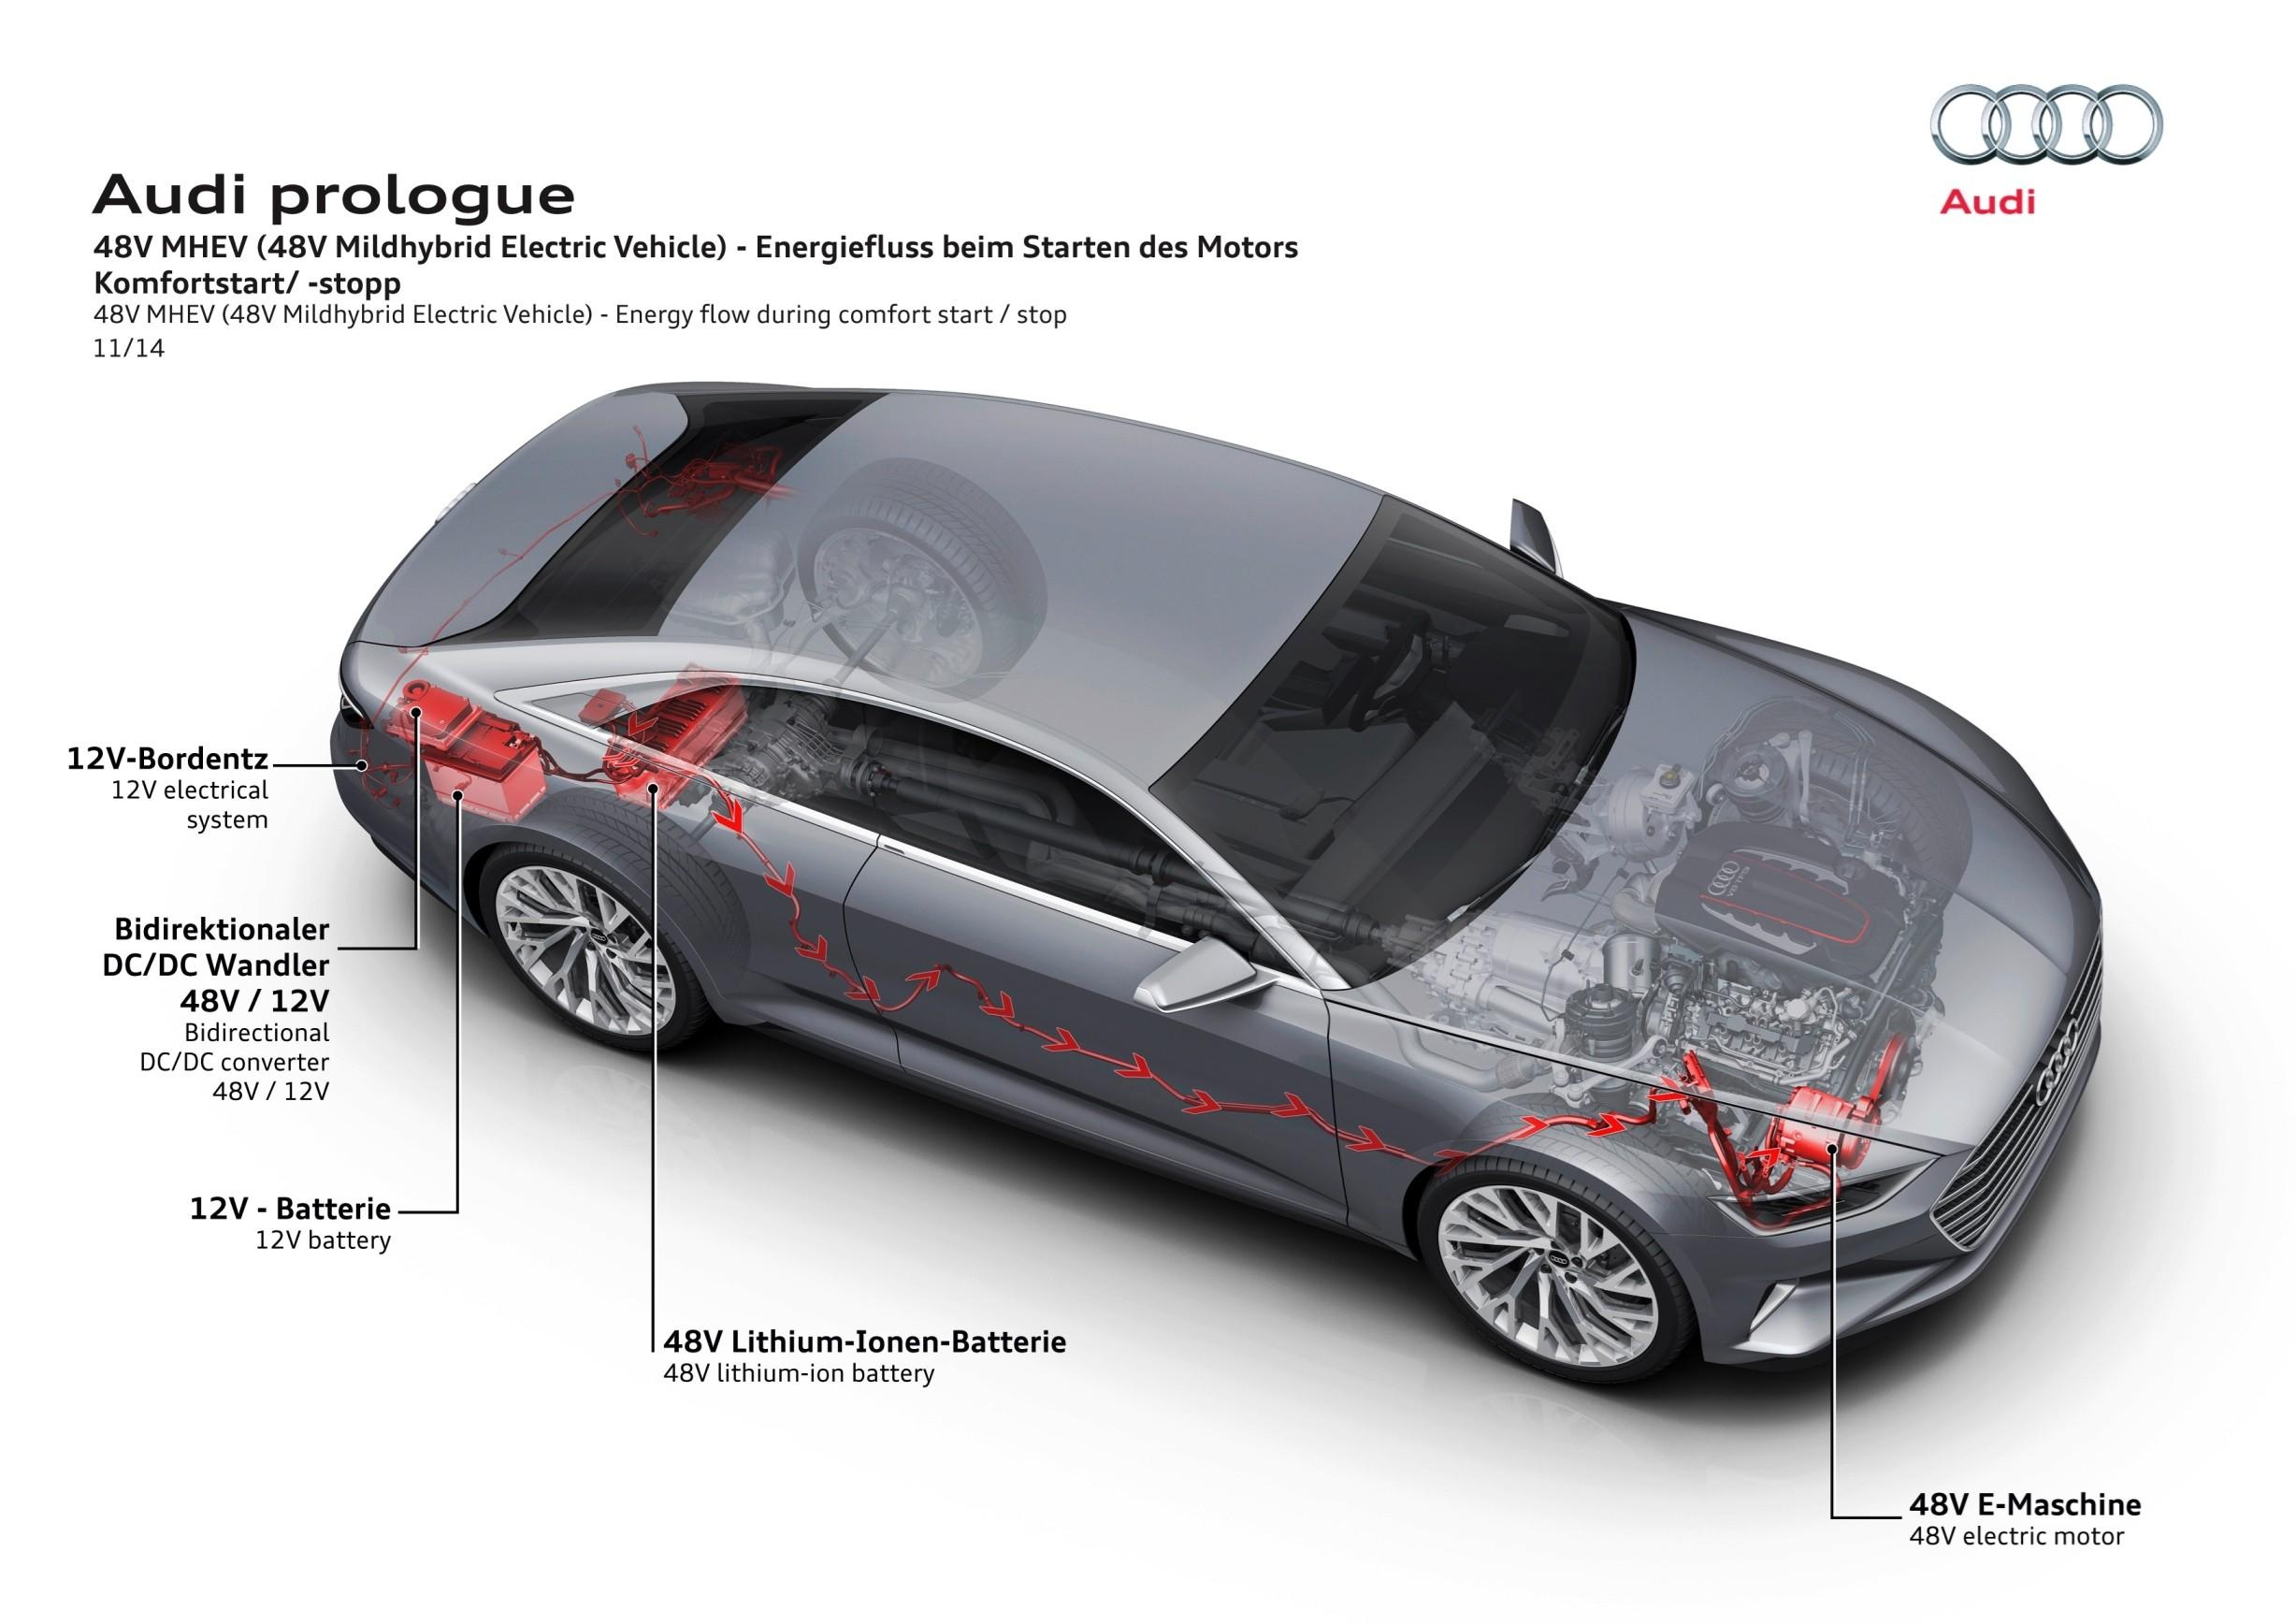 2014 Audi Prologue is Worst of LA 2014 11